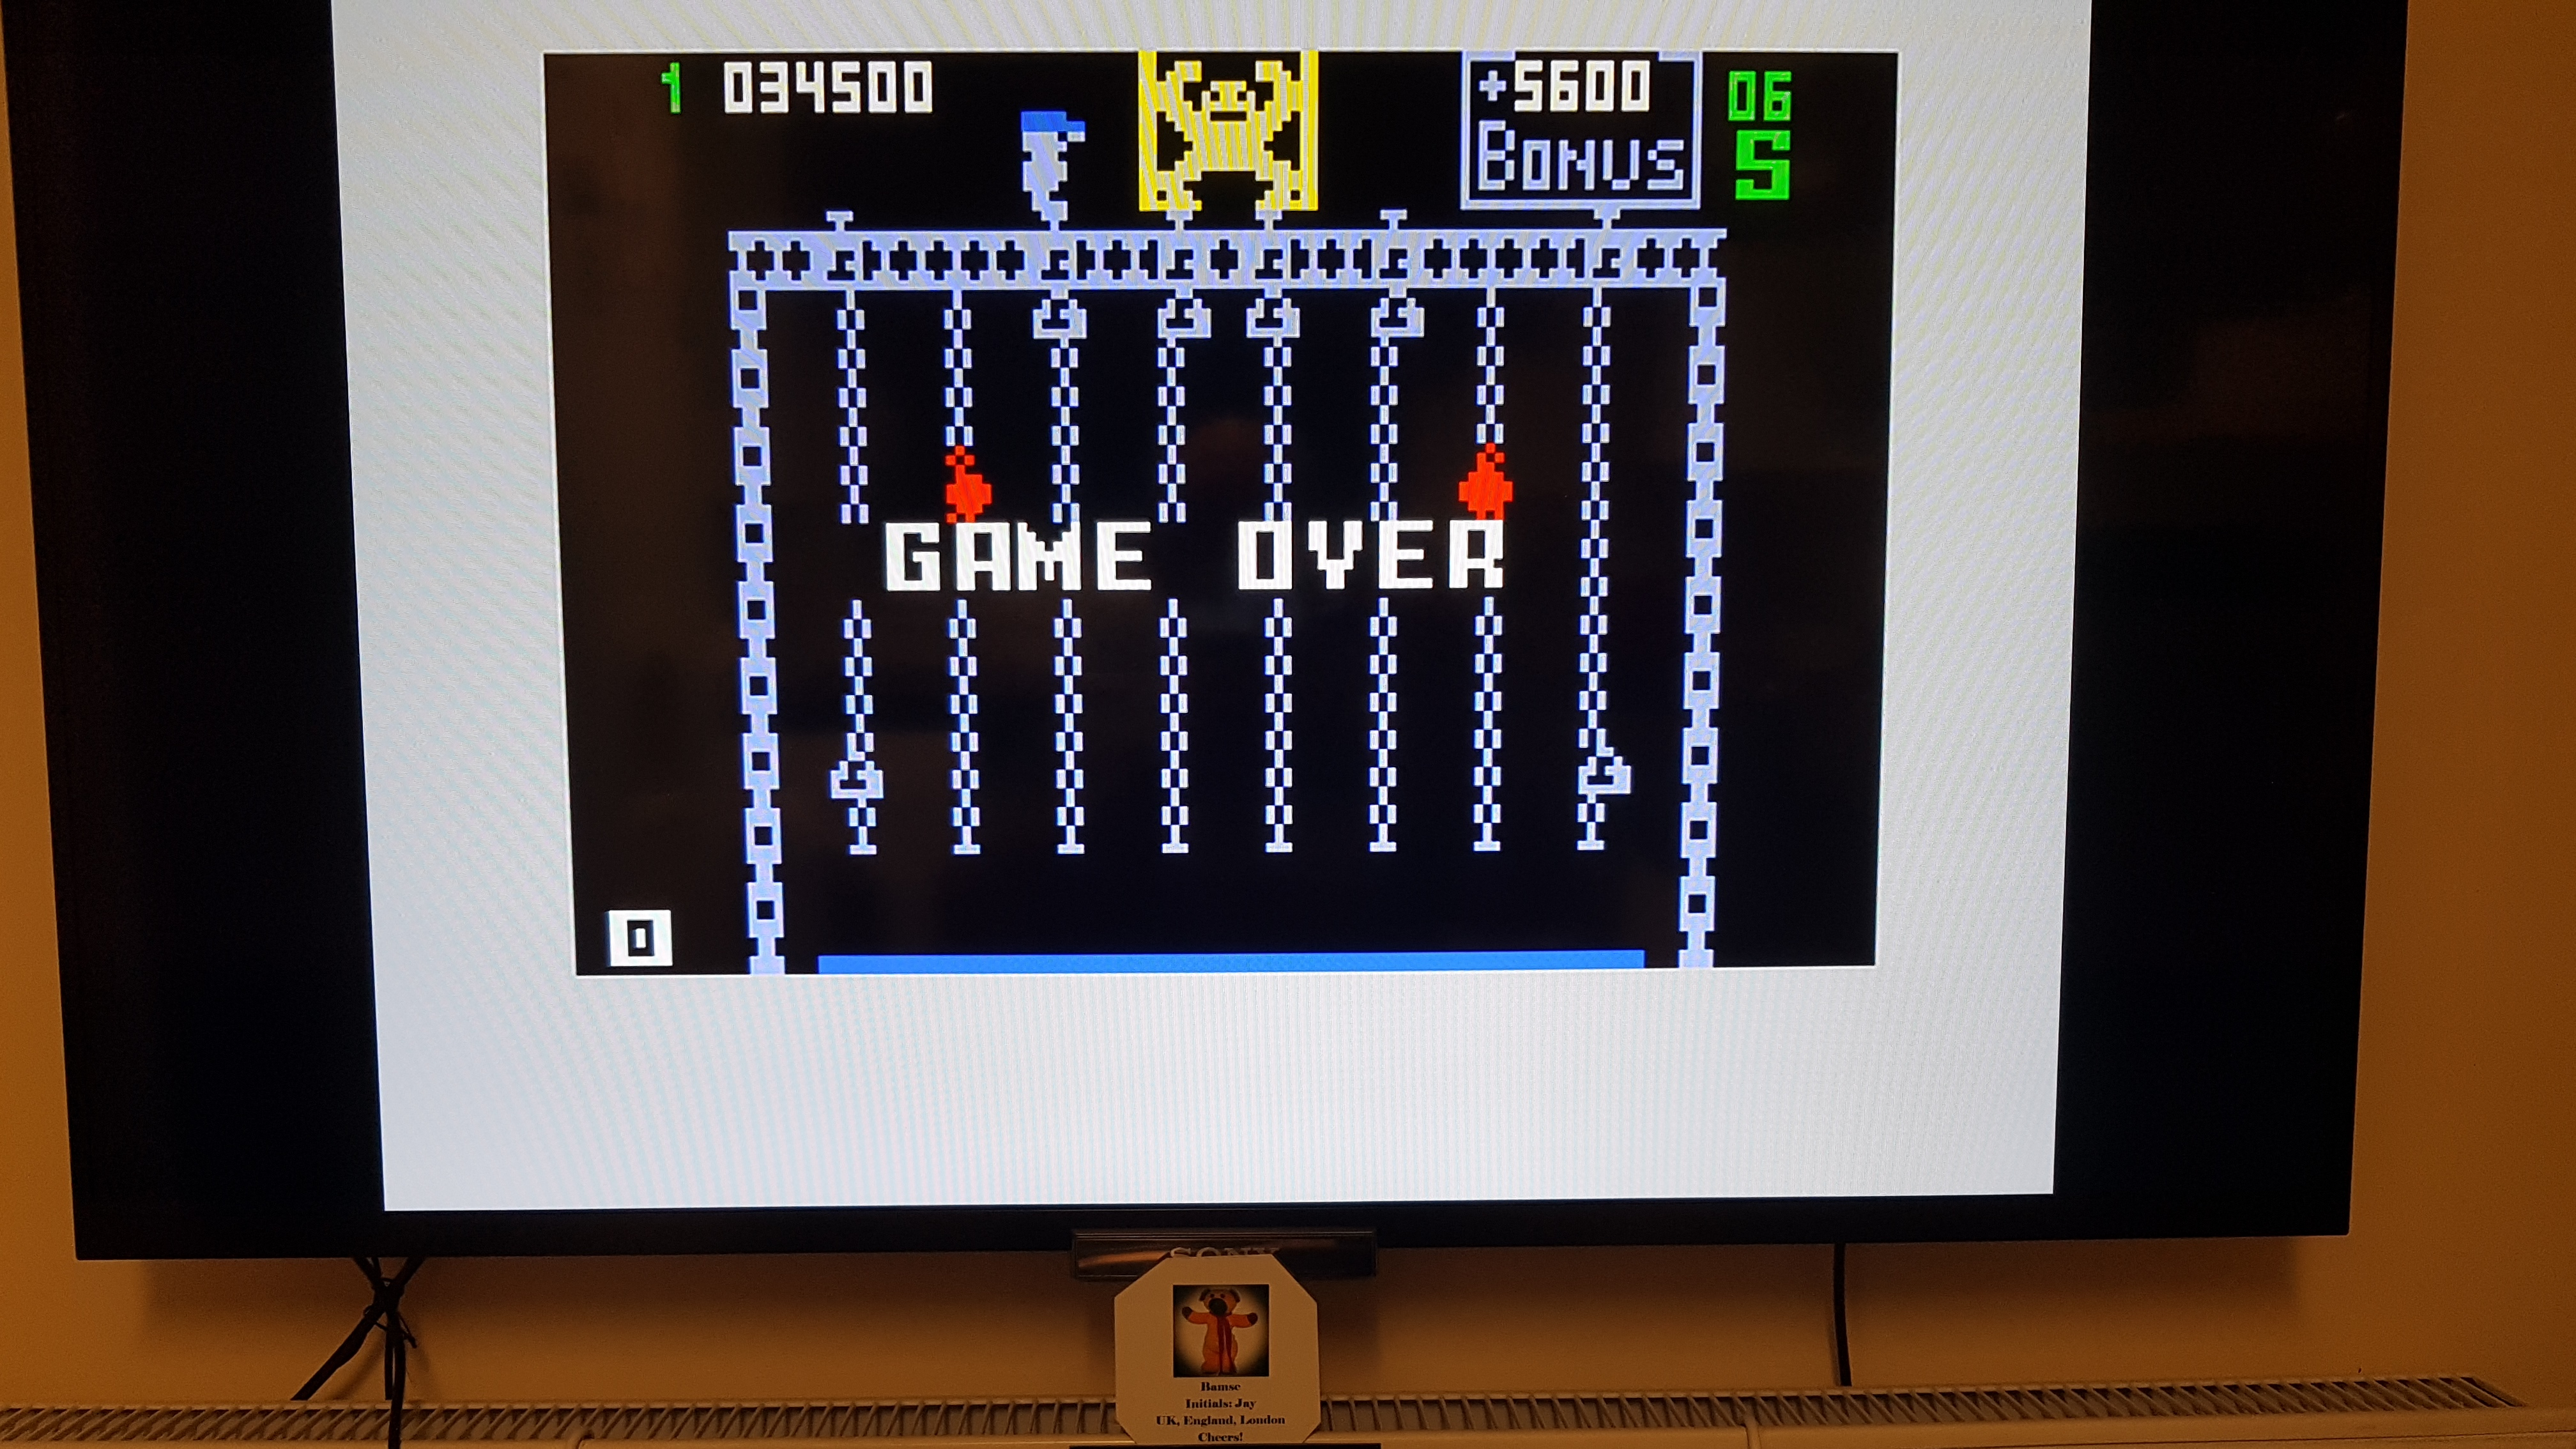 Bamse: Donkey Kong Jr. [Level 1] (Intellivision) 34,500 points on 2019-04-28 15:10:21